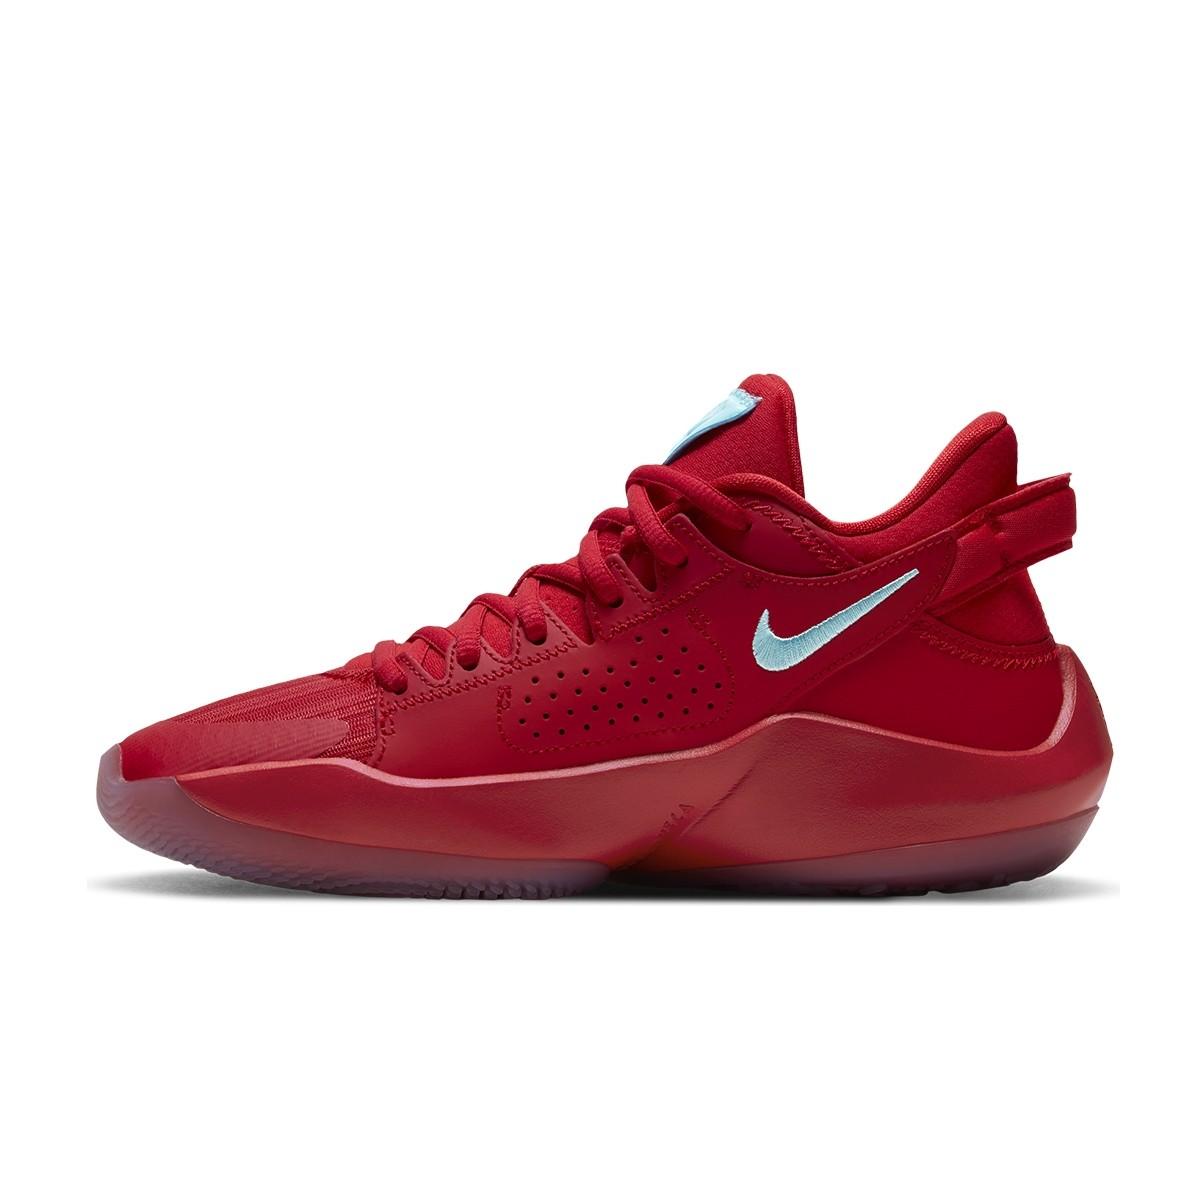 Nike Zoom Freak 2 GS 'Red Glacier Ice'-CN8574-605